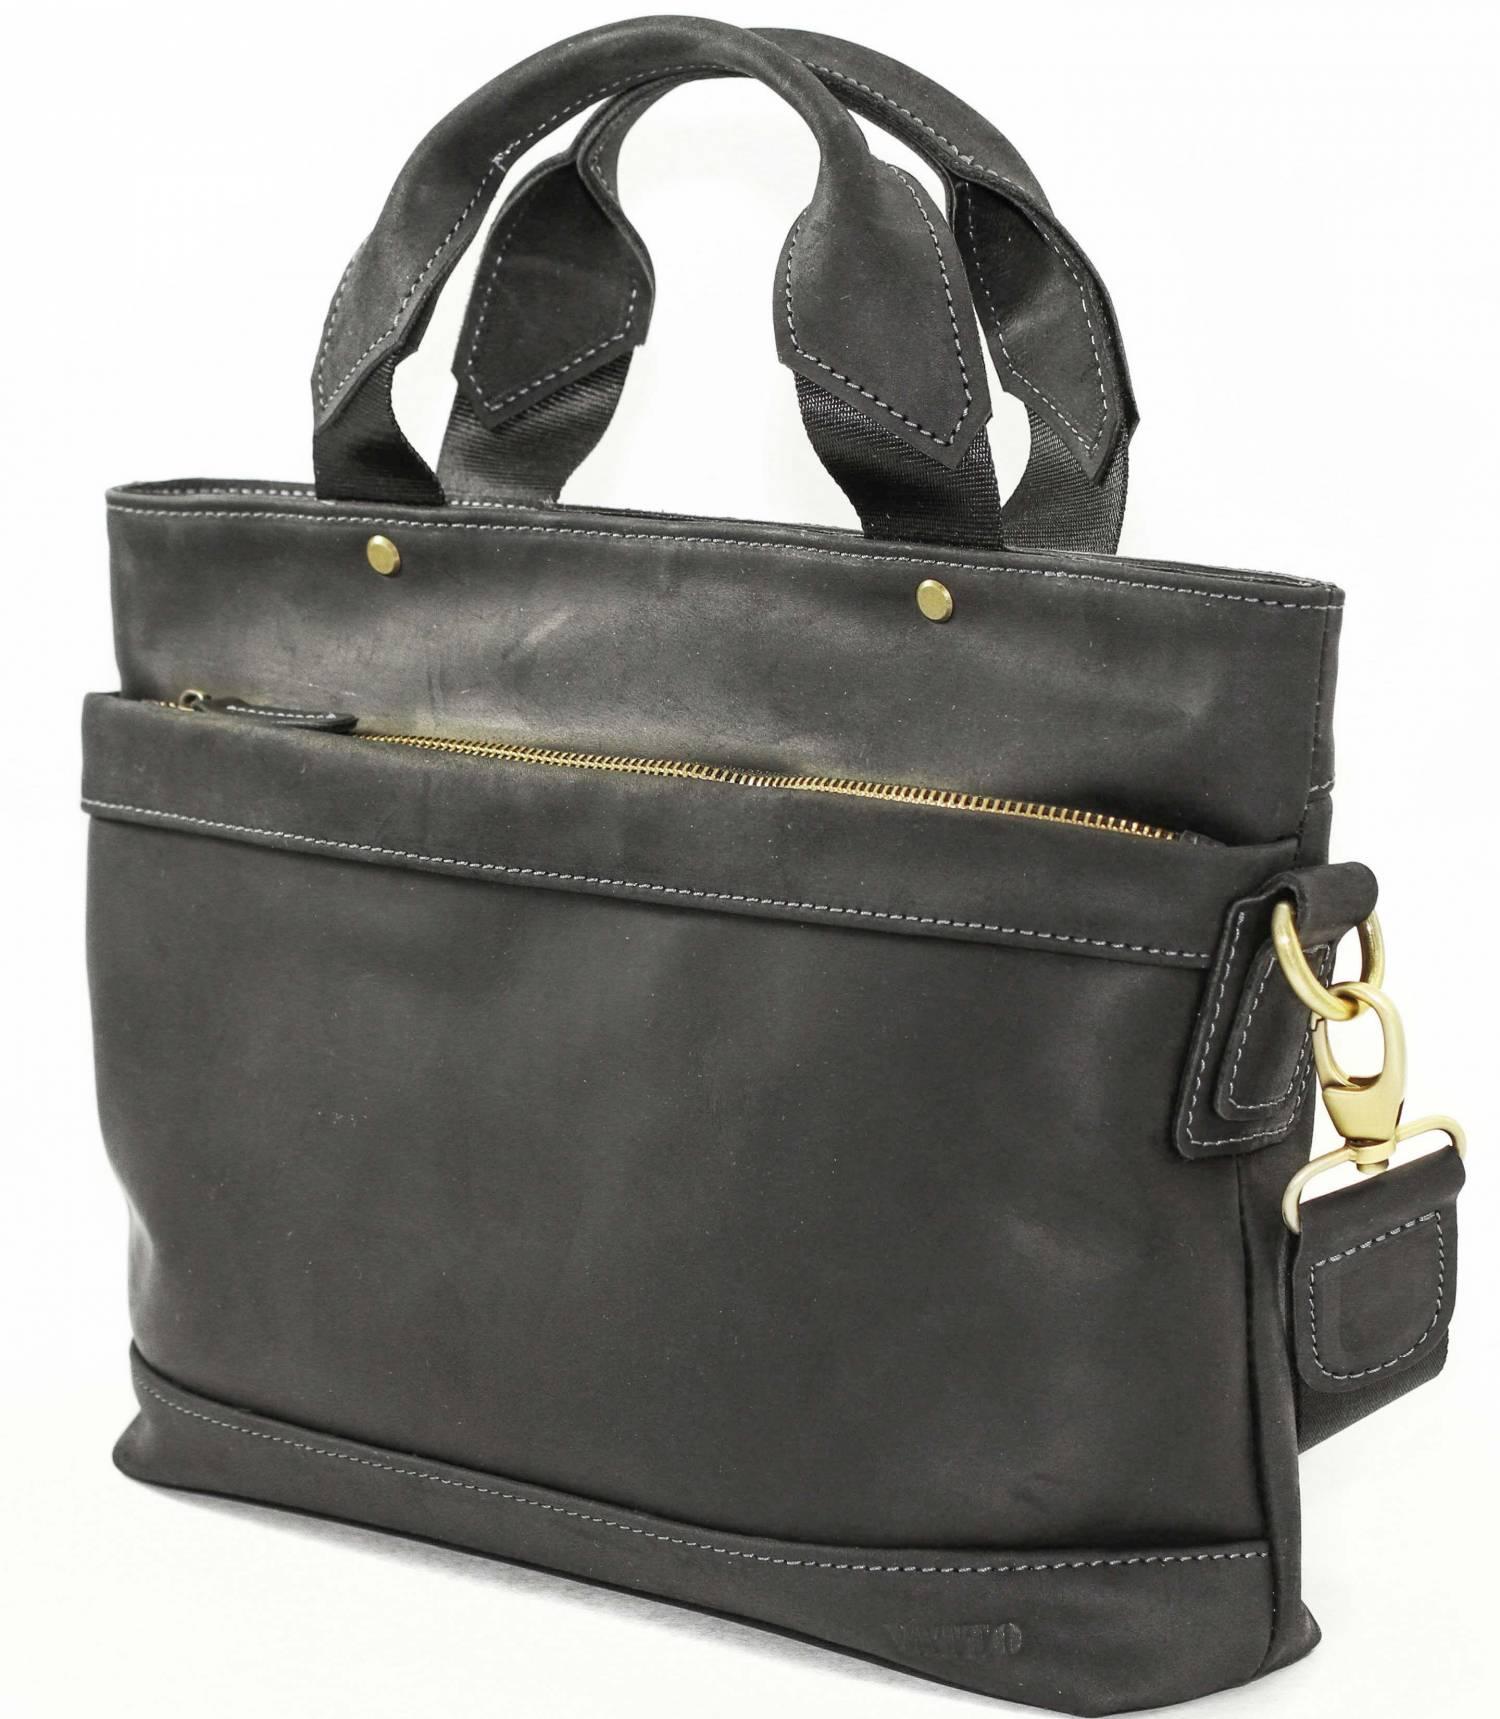 298230f35562 Мужская сумка VATTO Mk13.2 Kr670. Цена, купить Мужская сумка VATTO ...